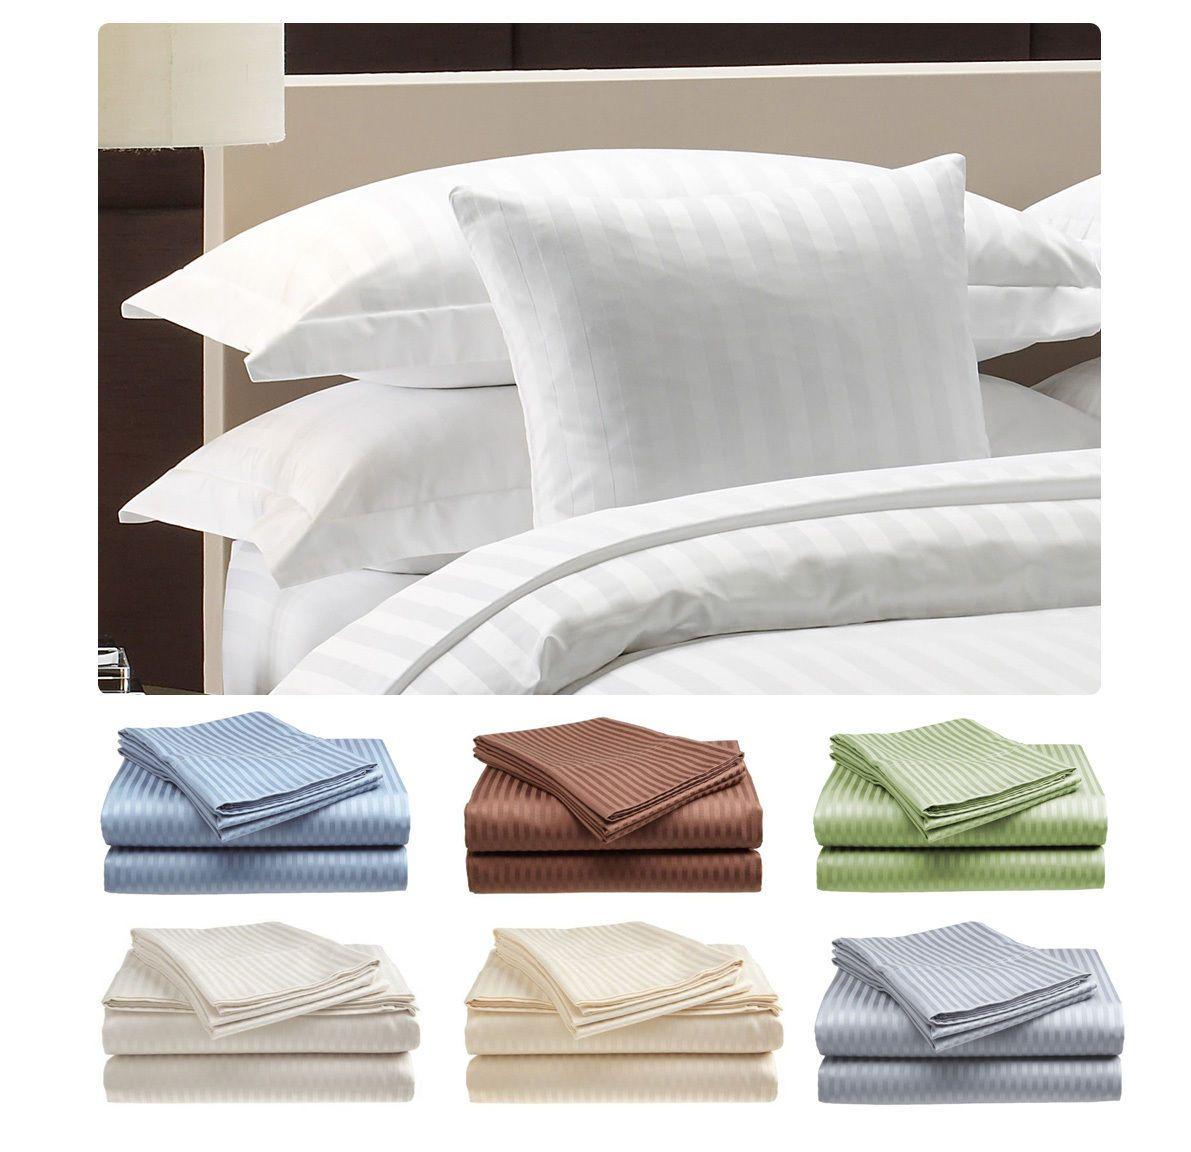 Deluxe Hotel 300 Thread Count 100 Cotton Sateen Sheet Set Dobby Stripe Ebay Luxury Sheet Sets Striped Bed Sheets Designer Bed Sheets 300 thread count cotton sheets